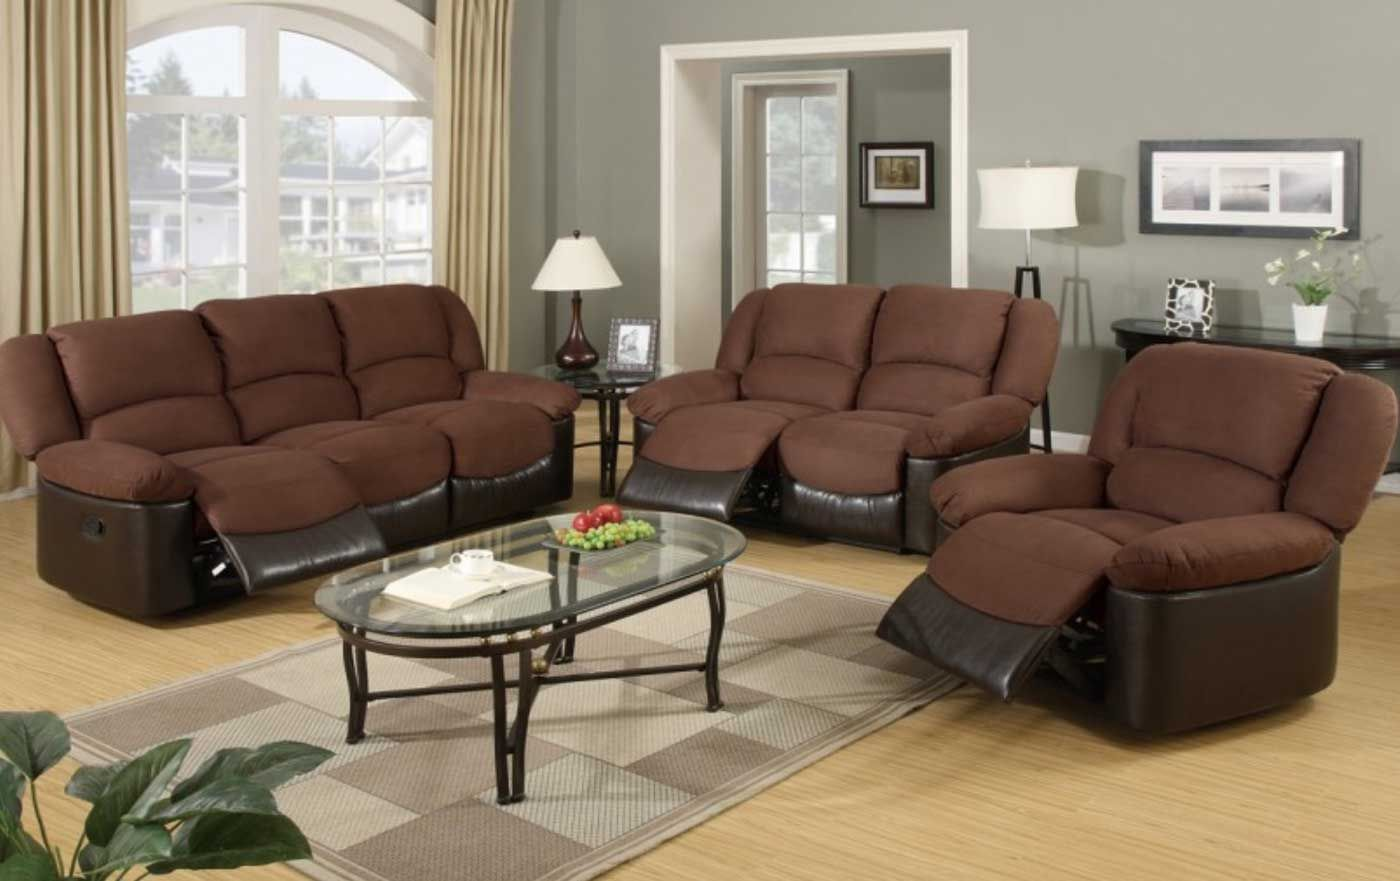 Medium Of Living Room Set Up